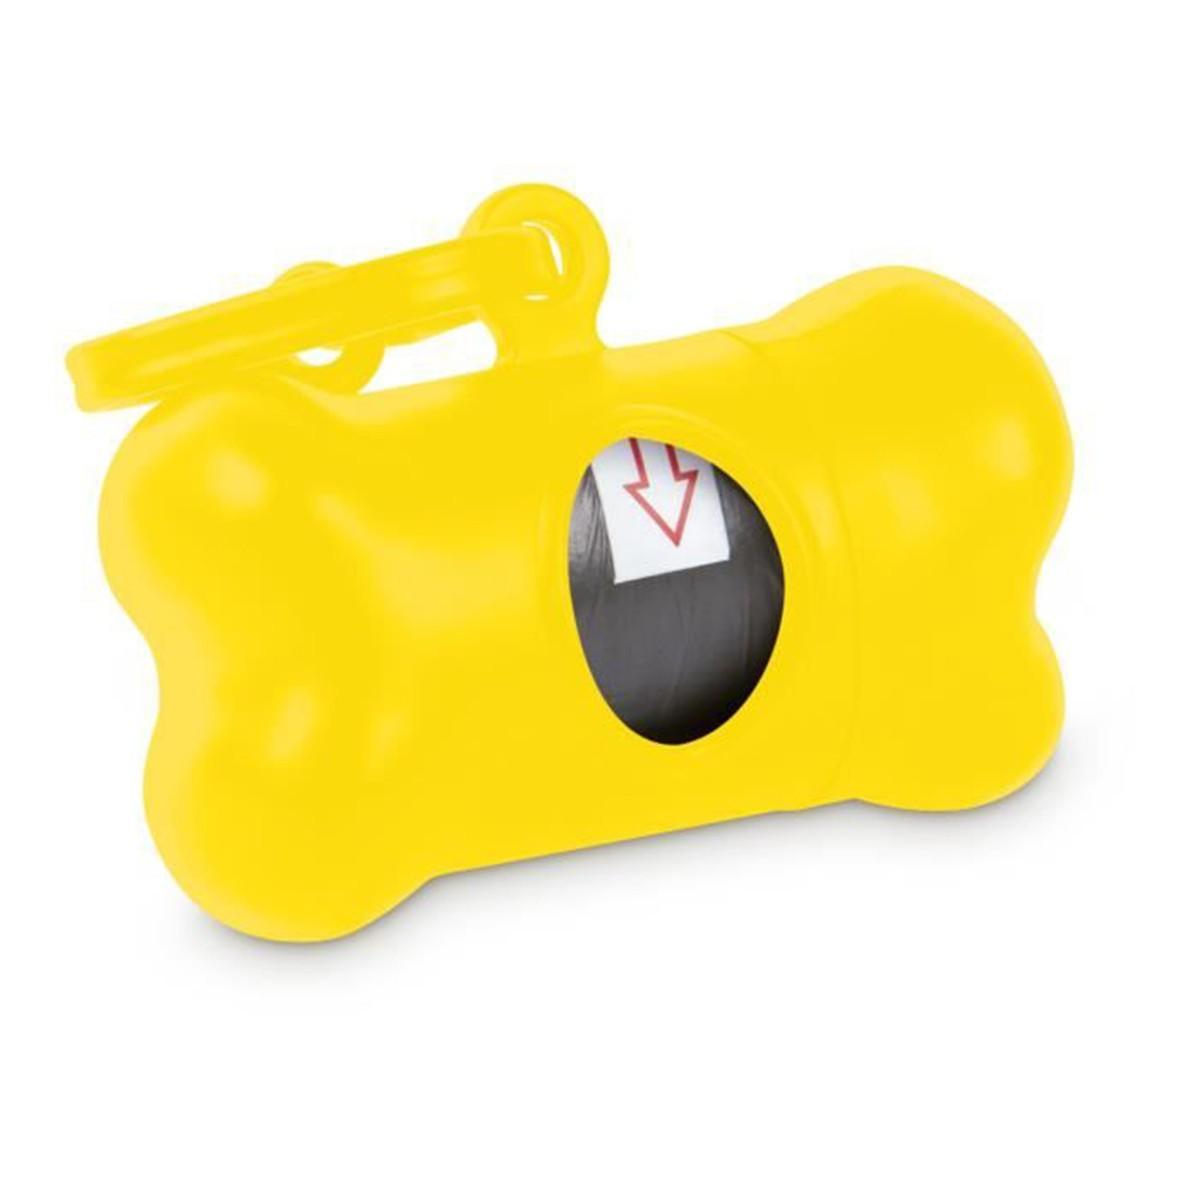 Kit de Aseo para Mascota Dispensador Porta Bolsas para excremento